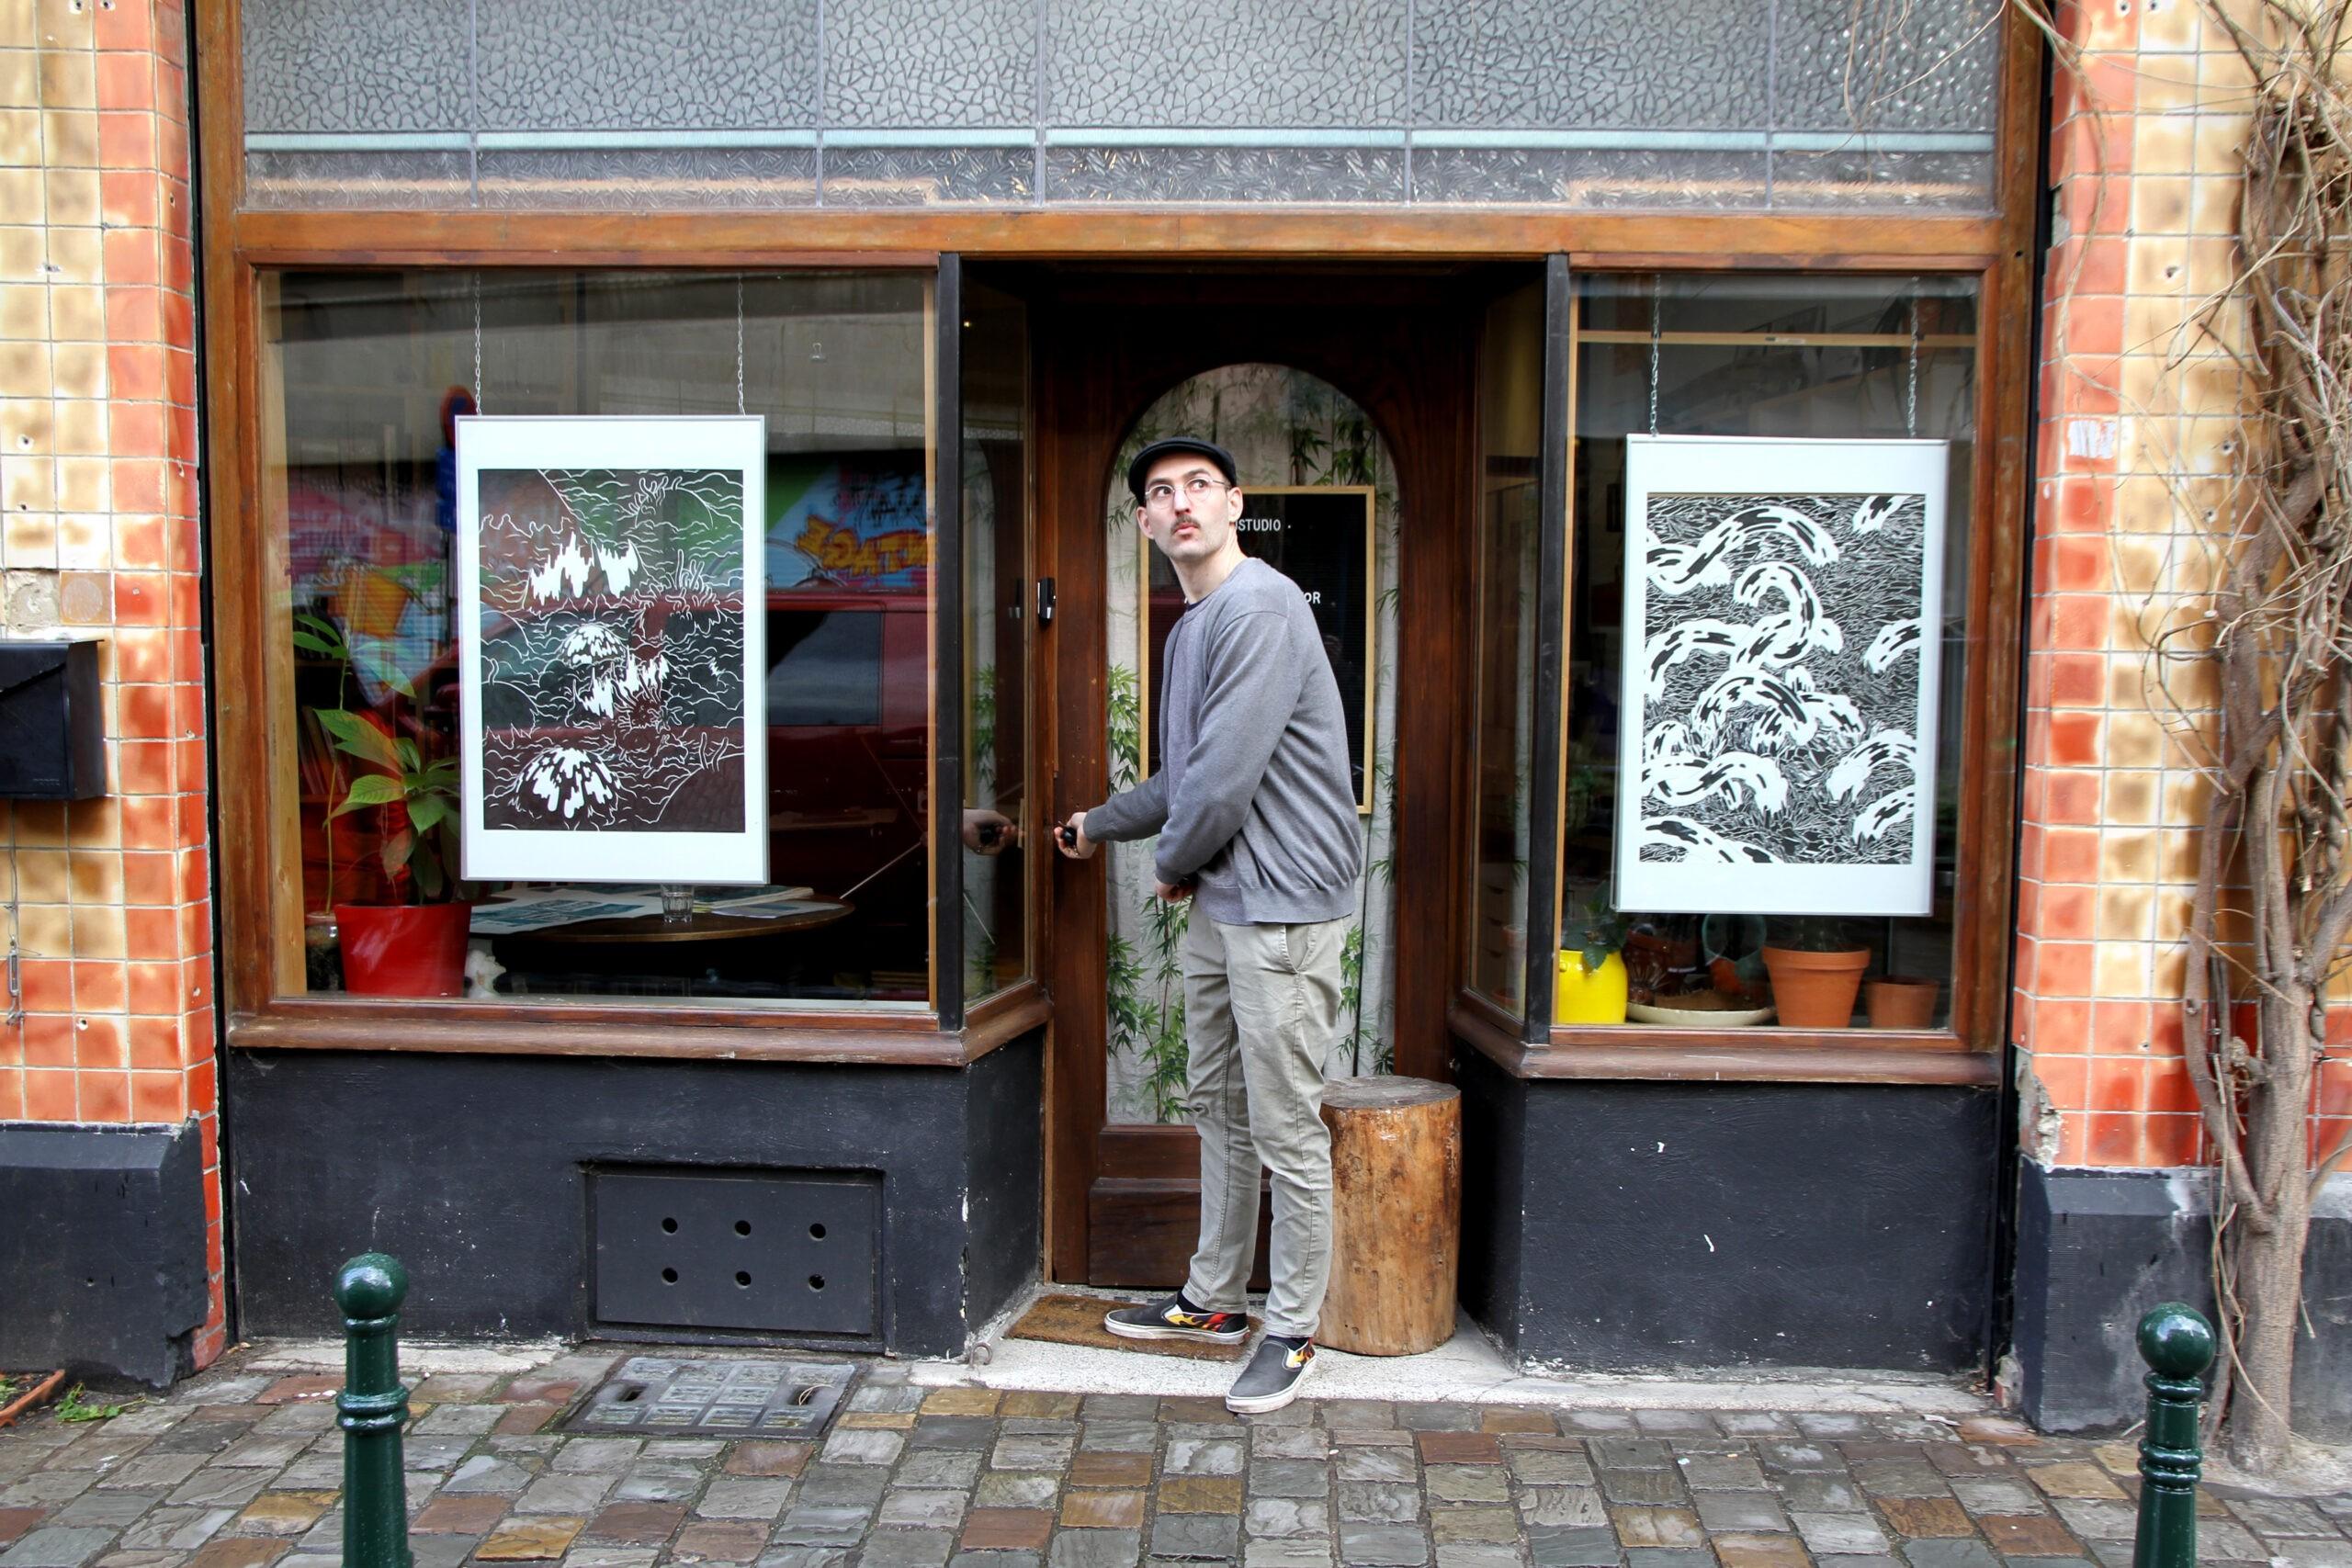 Joost Jansen (c) Kunstletters